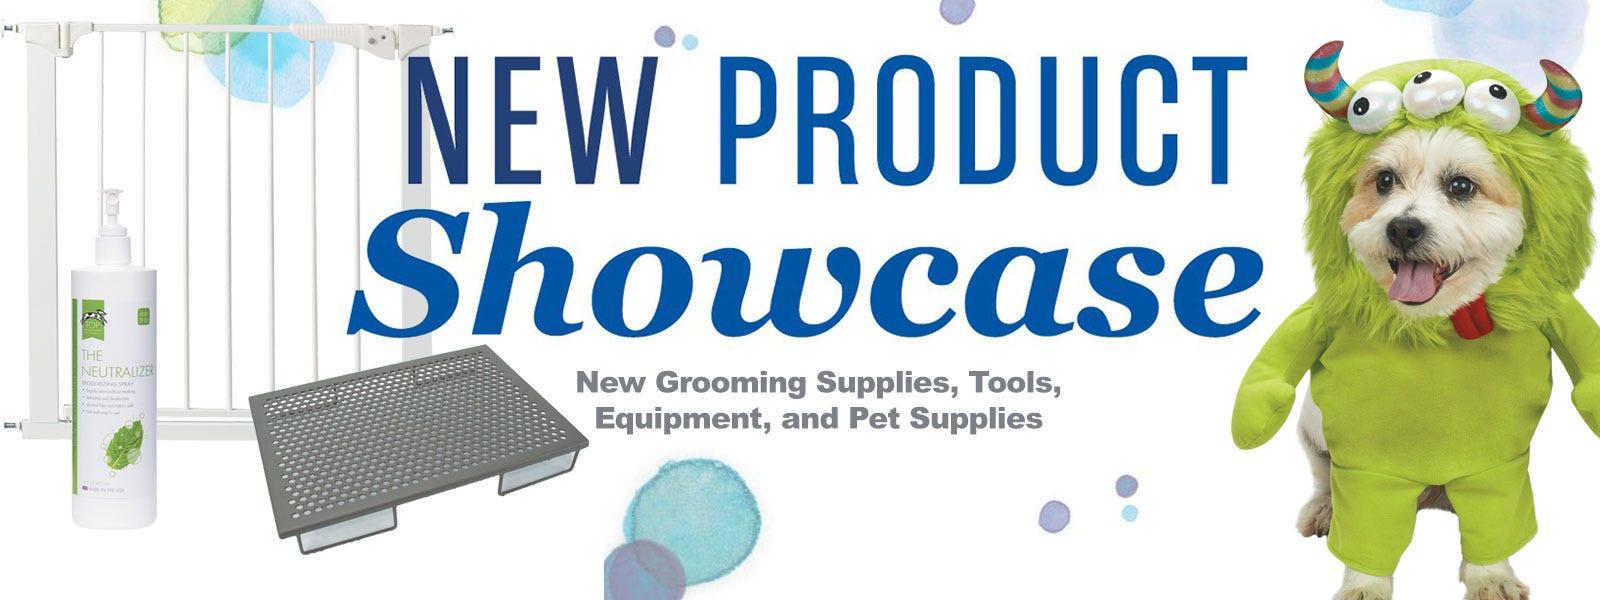 New Pet Product Showcase